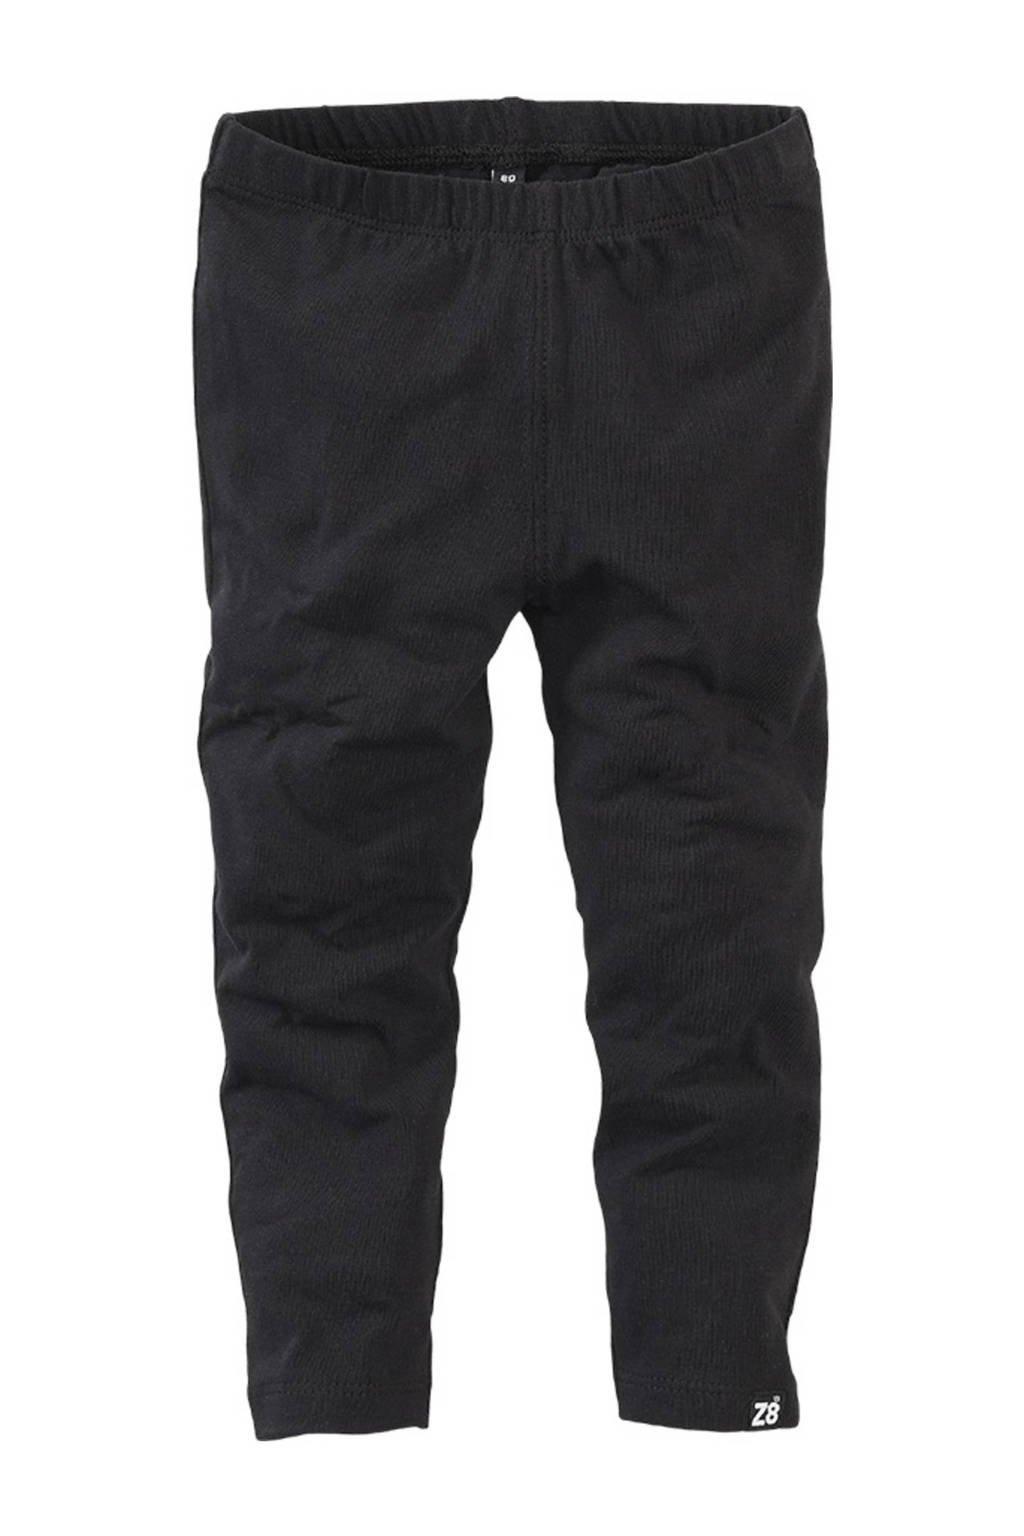 Z8 legging Canberra zwart, Zwart